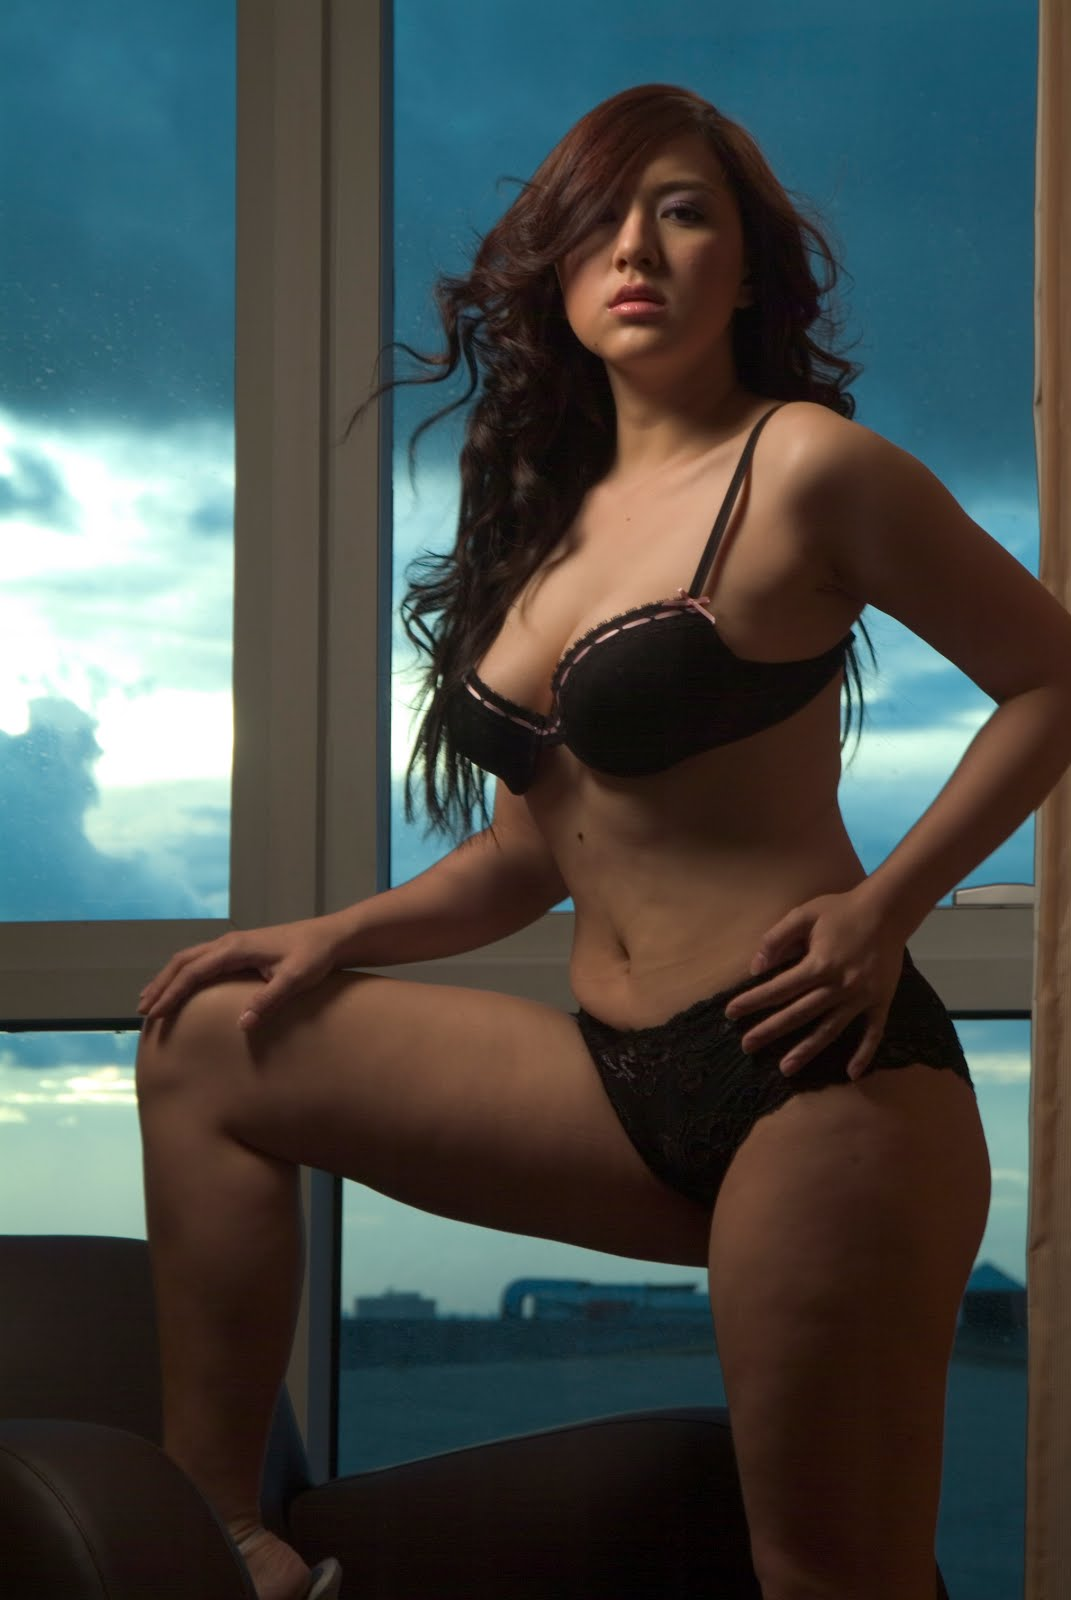 Ara mina chubby nude photo shoot - Adult archive